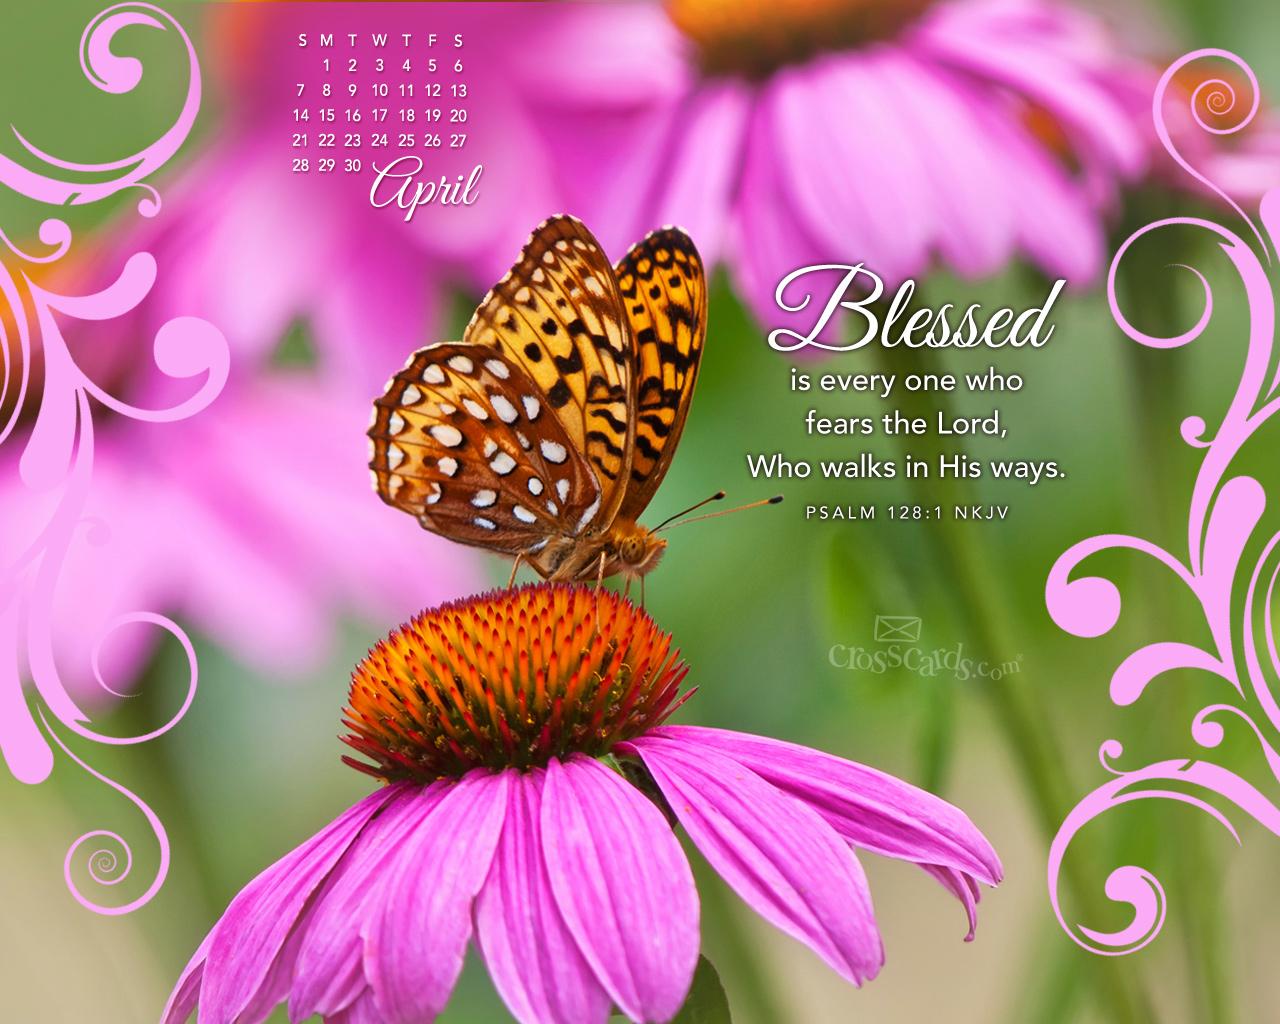 2016 Bible Verse Greetings Card Wallpapers April Month Desktop 1280x1024